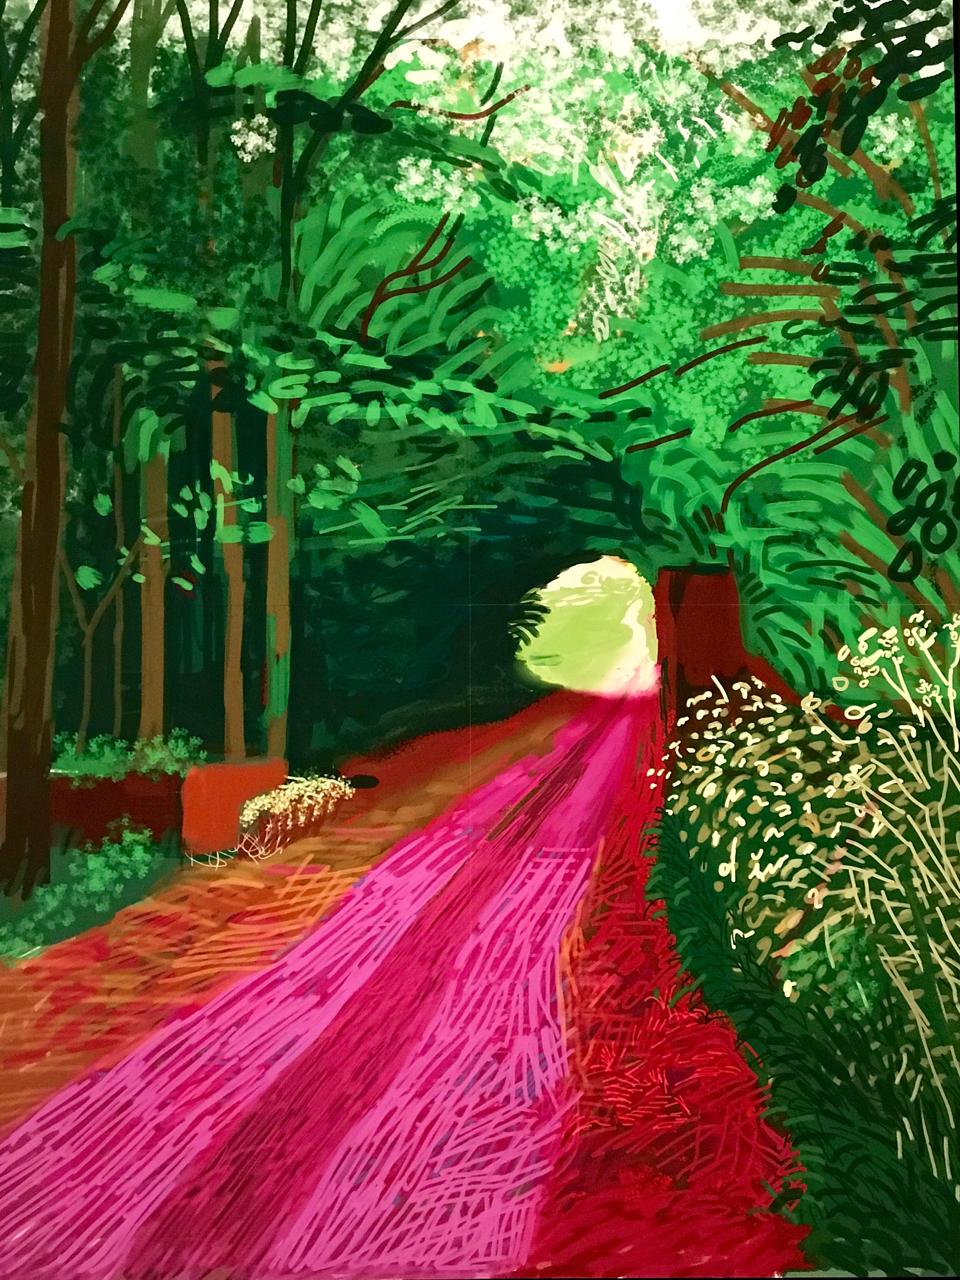 David-Hockney-the-arrival-of-spring